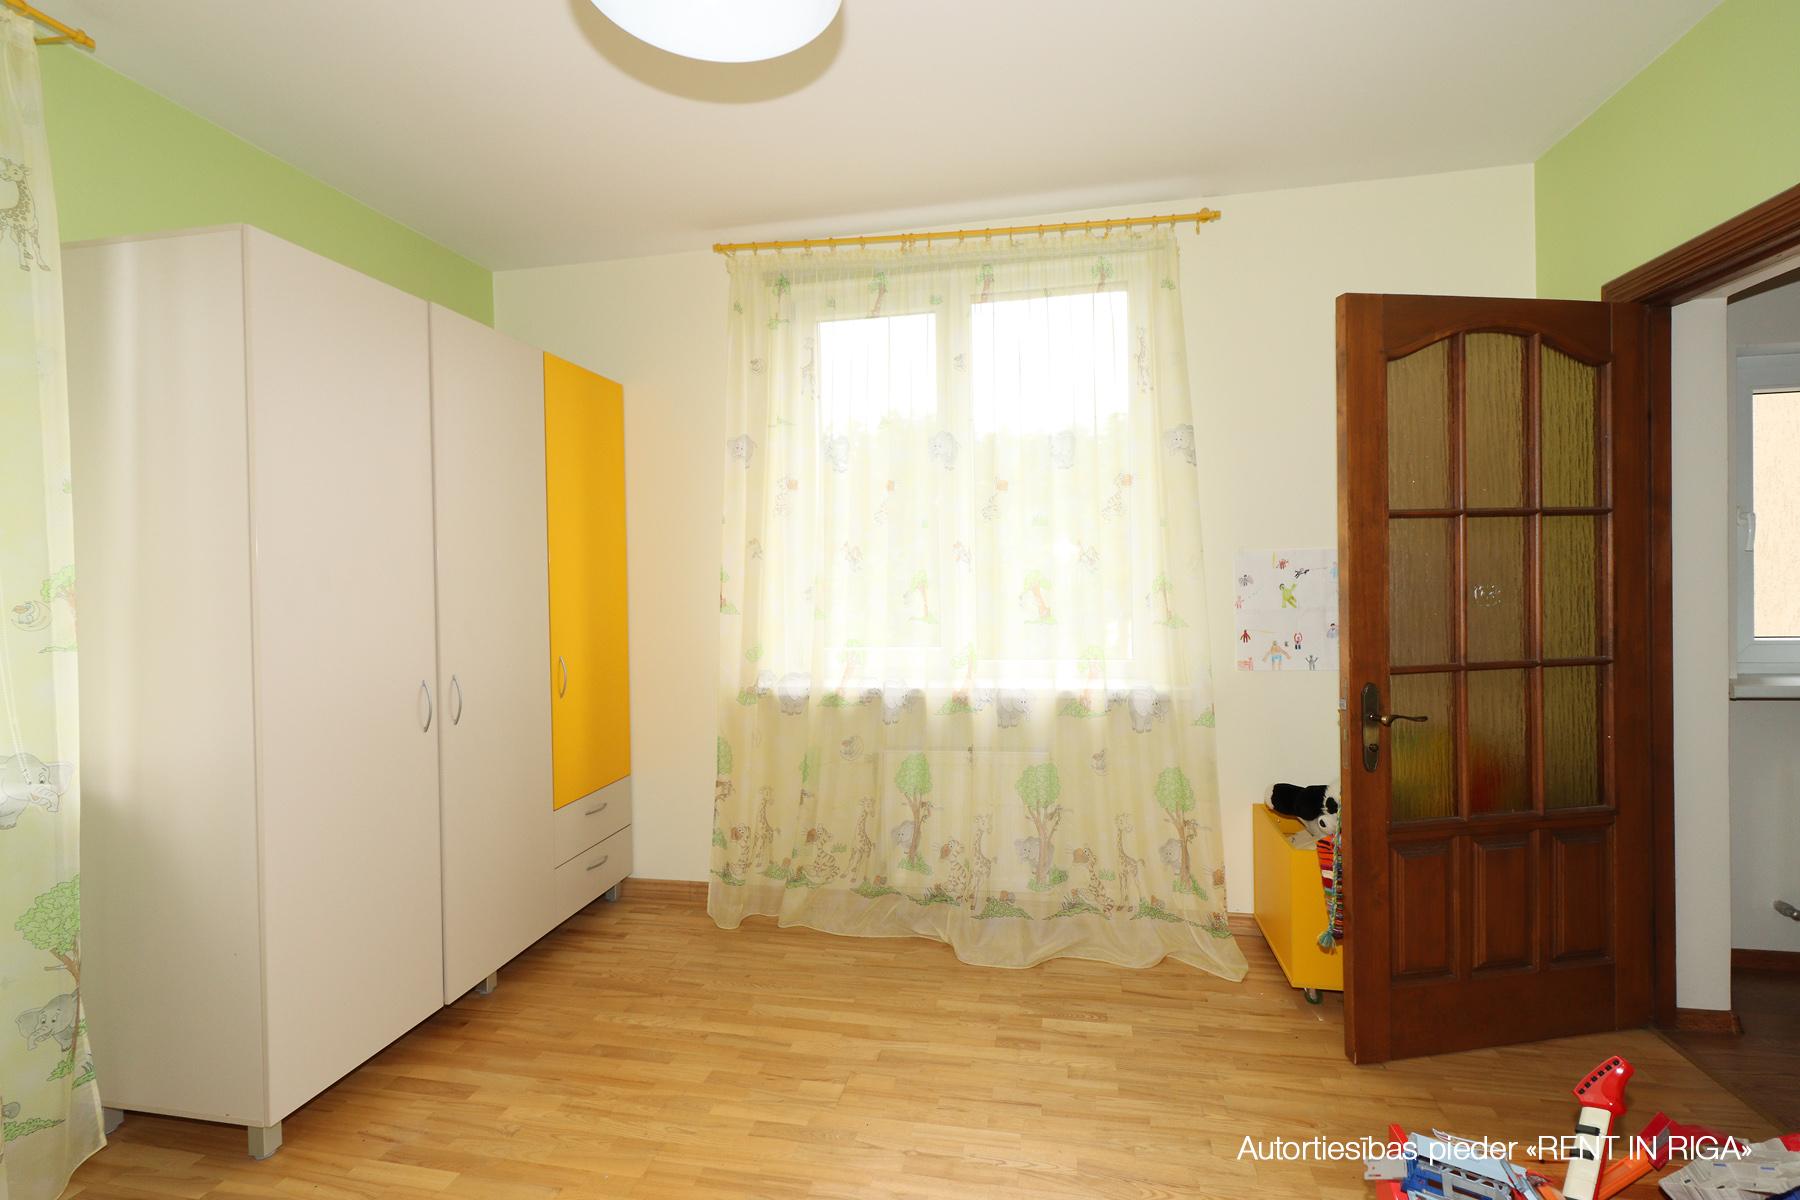 House for sale, Ozolu street - Image 1